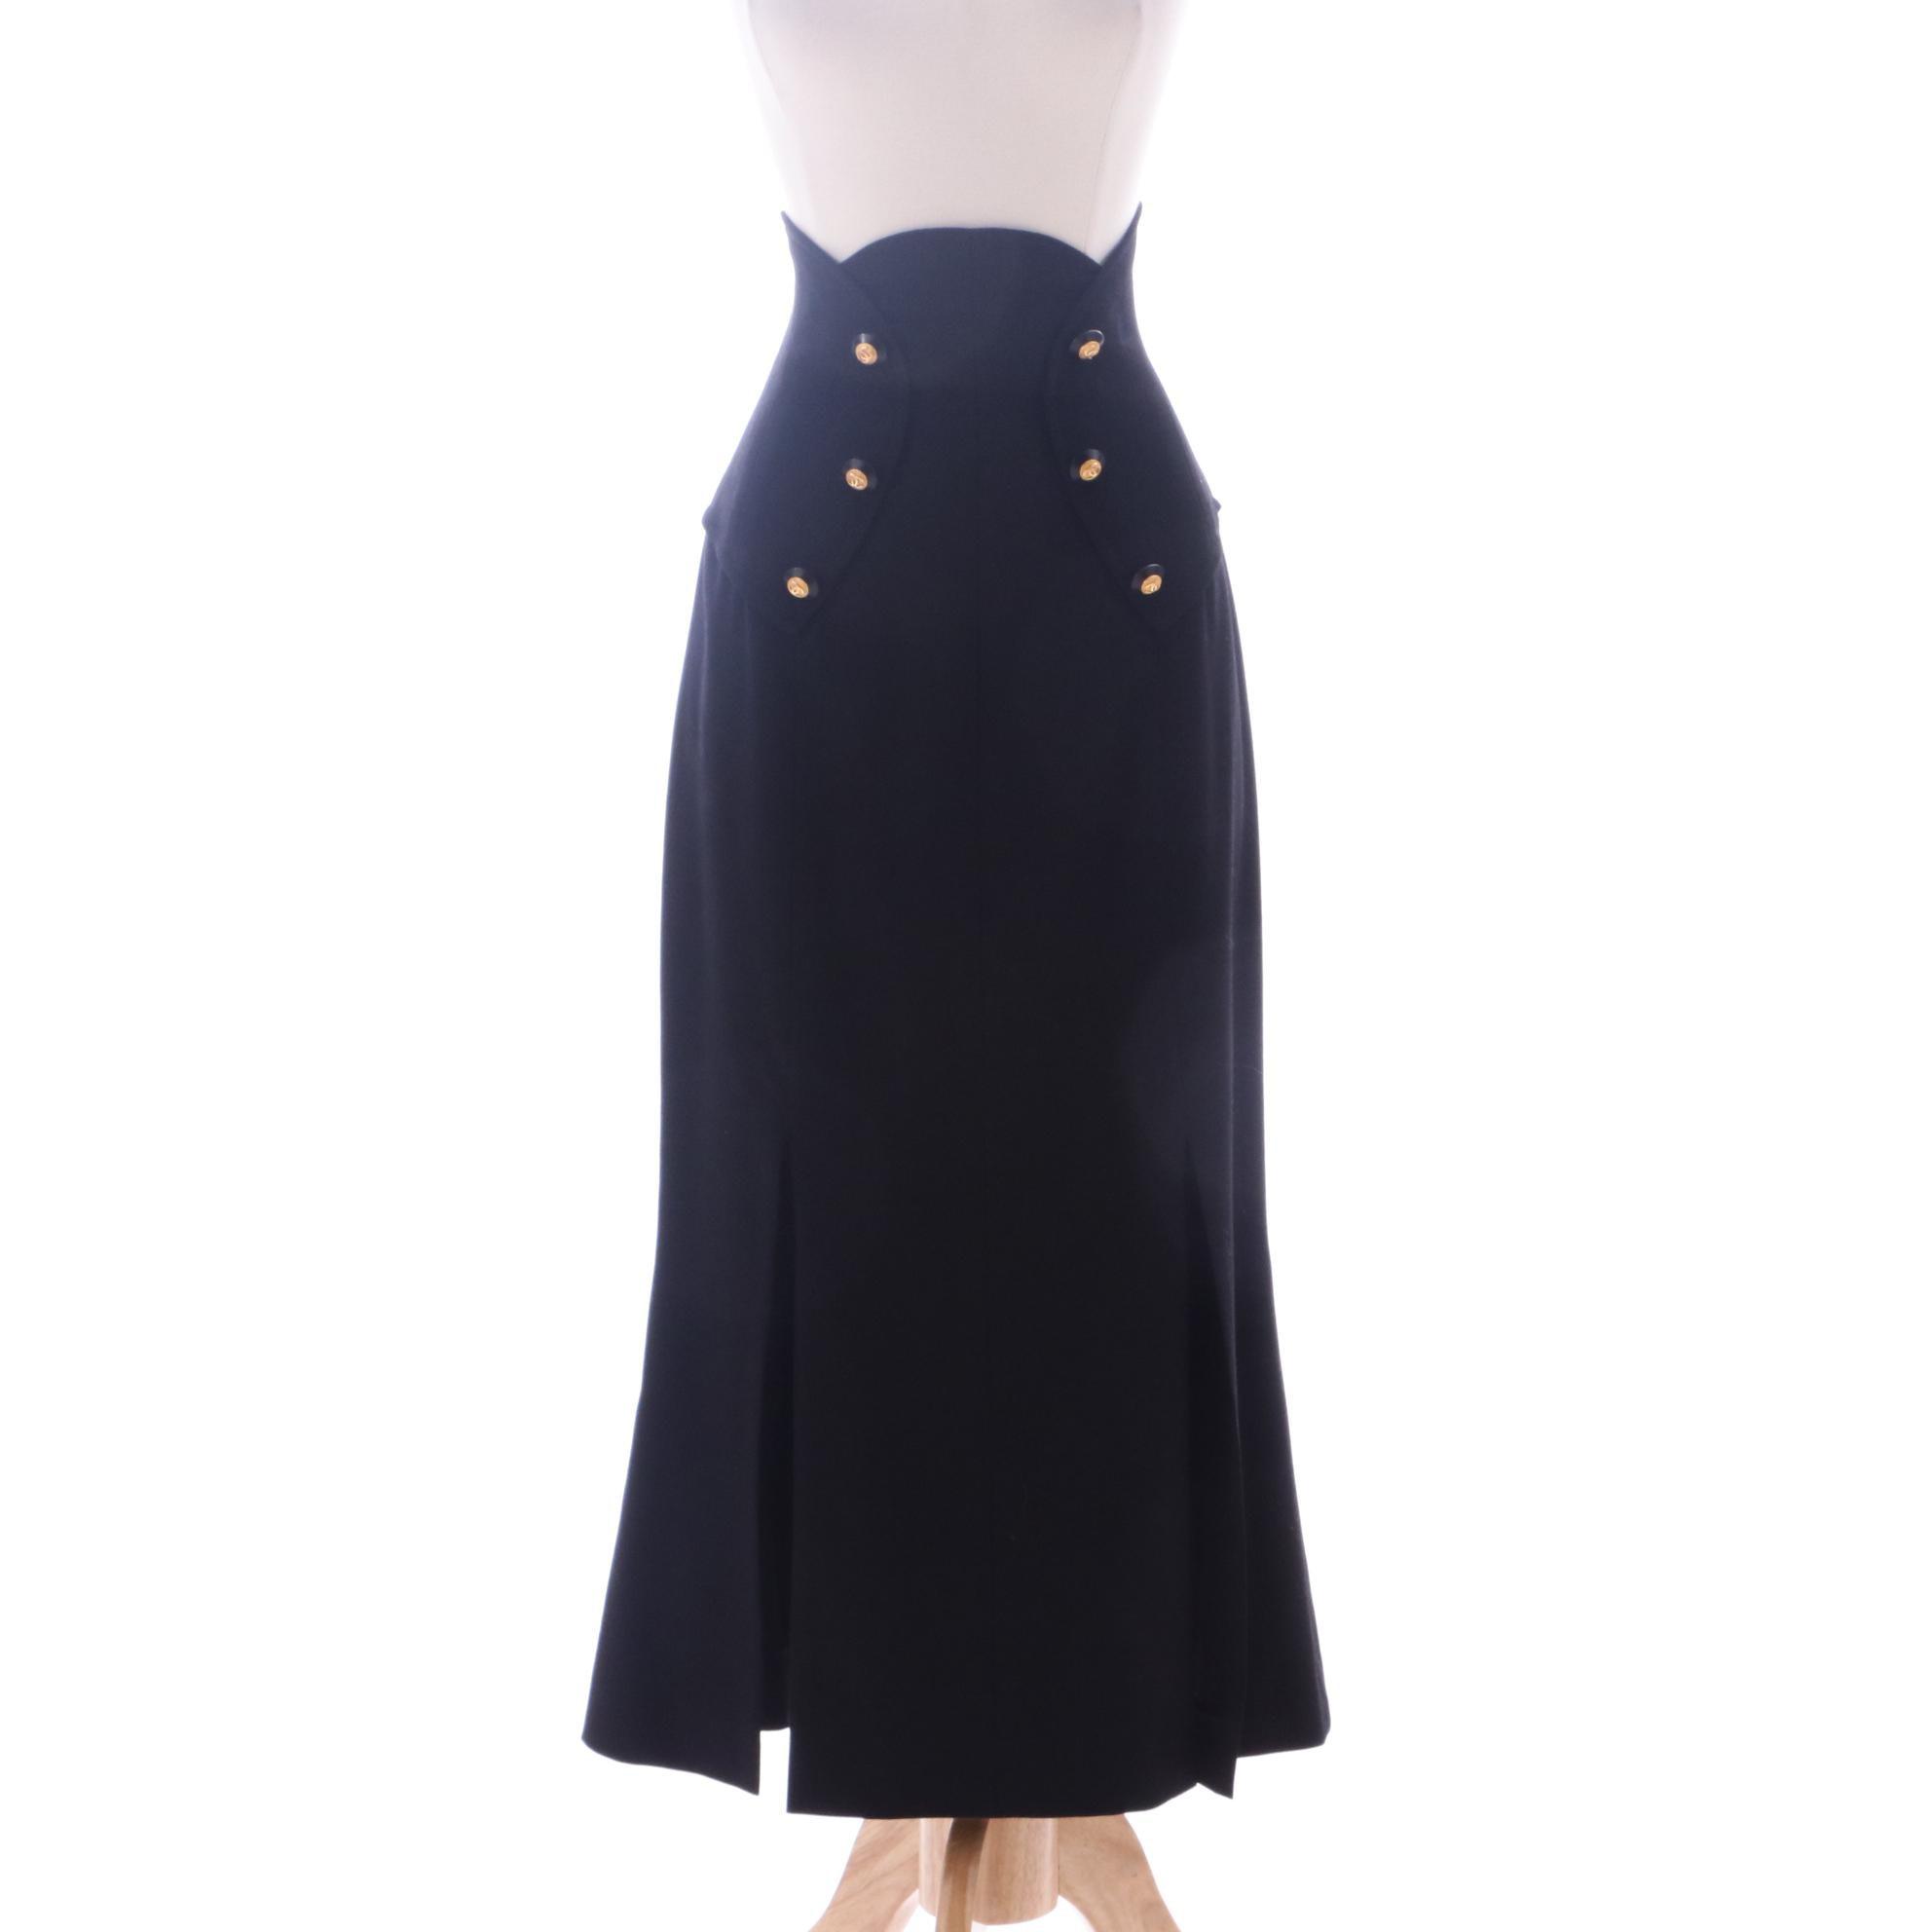 1990s Chanel Black High Waist Trumpet Skirt